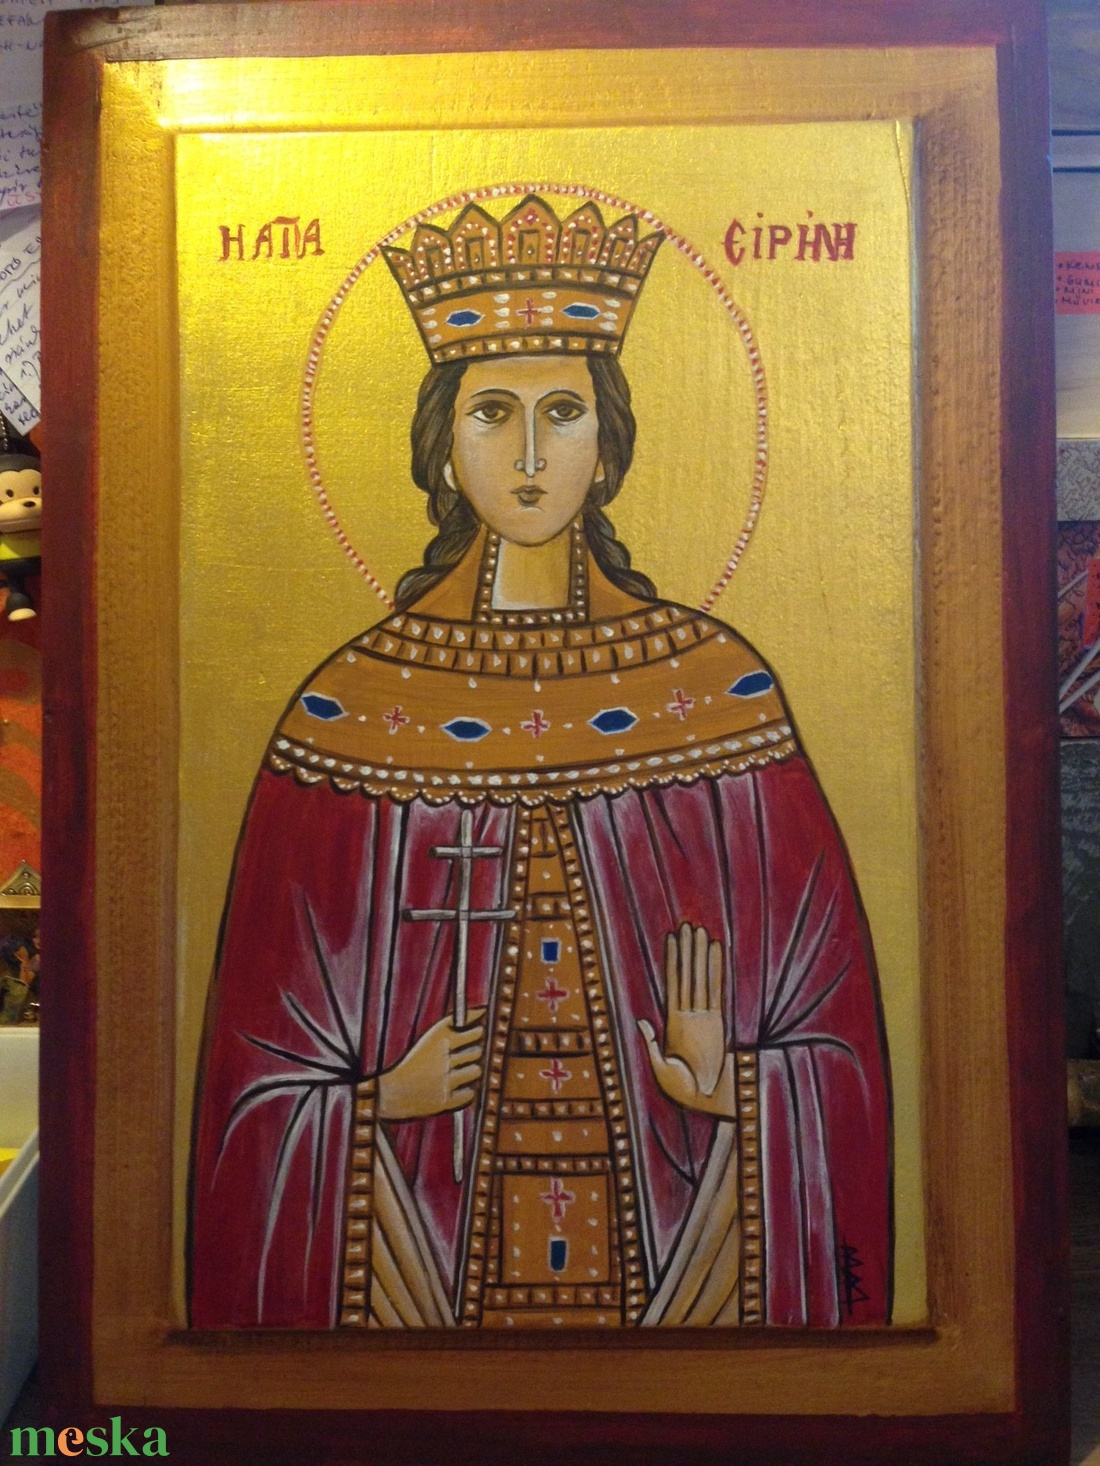 Szent Piroska ikon (BeuArt) - Meska.hu